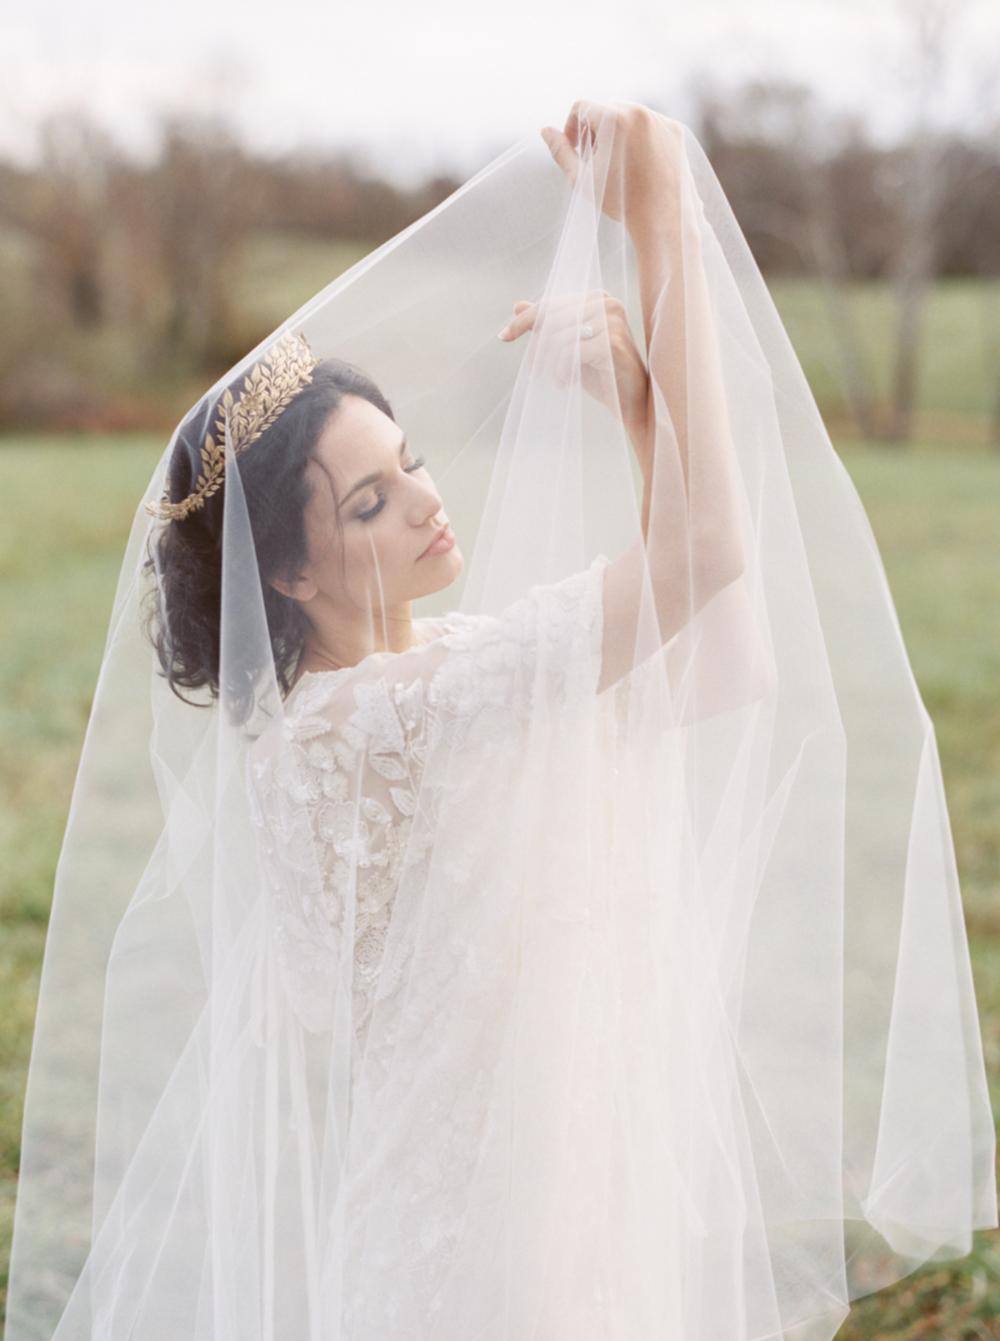 Carol Hannah Bridal Iolite Gown Shanon Moffit Photography 22.png